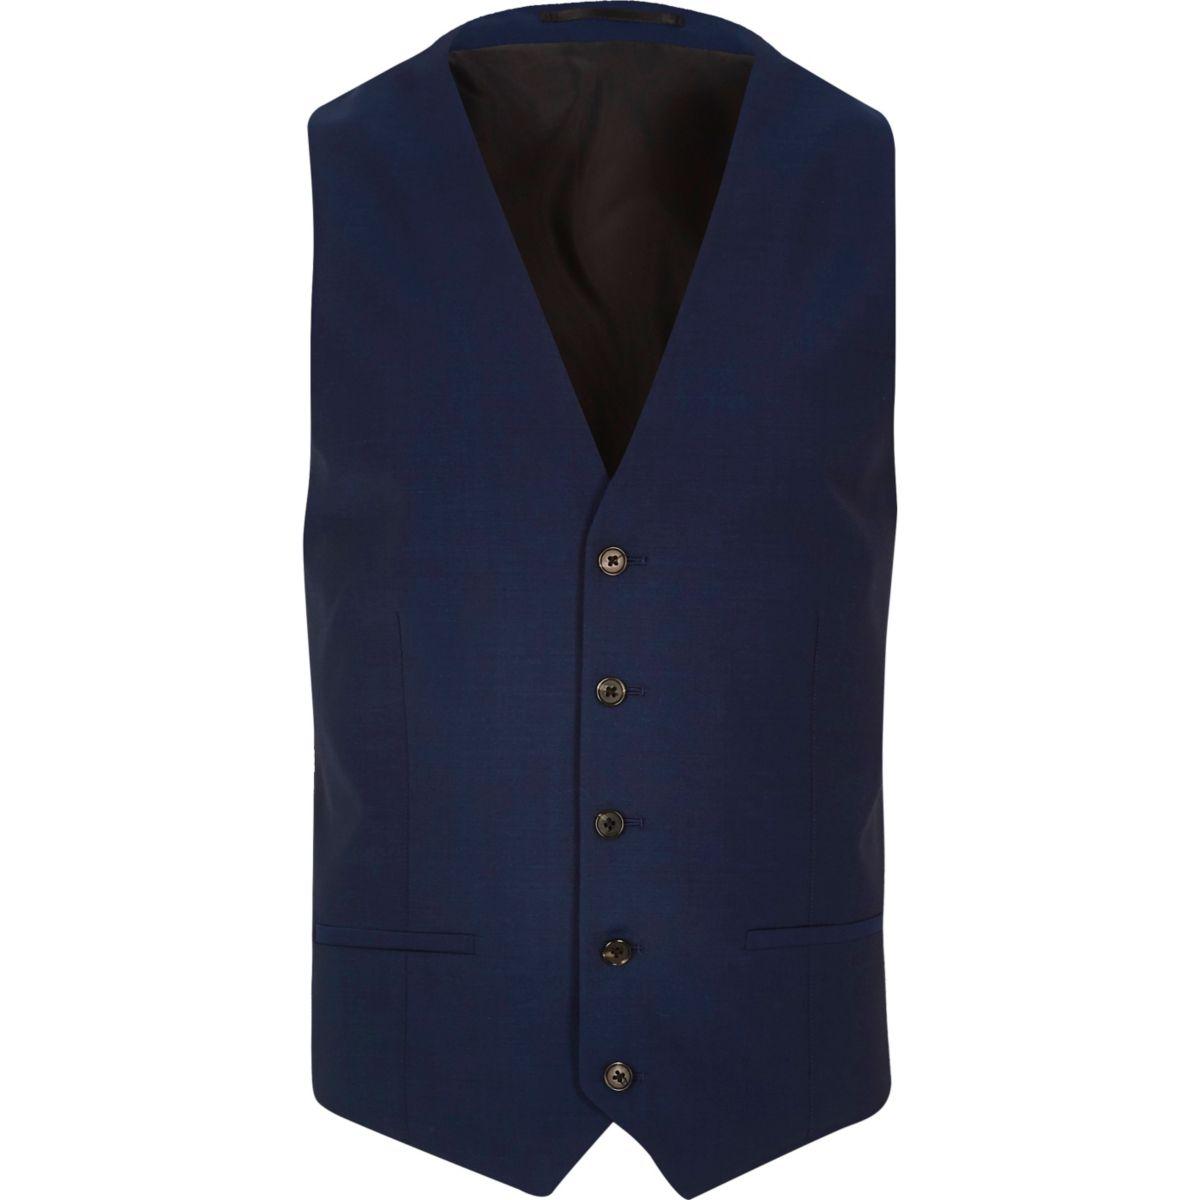 Bright blue slim waistcoat